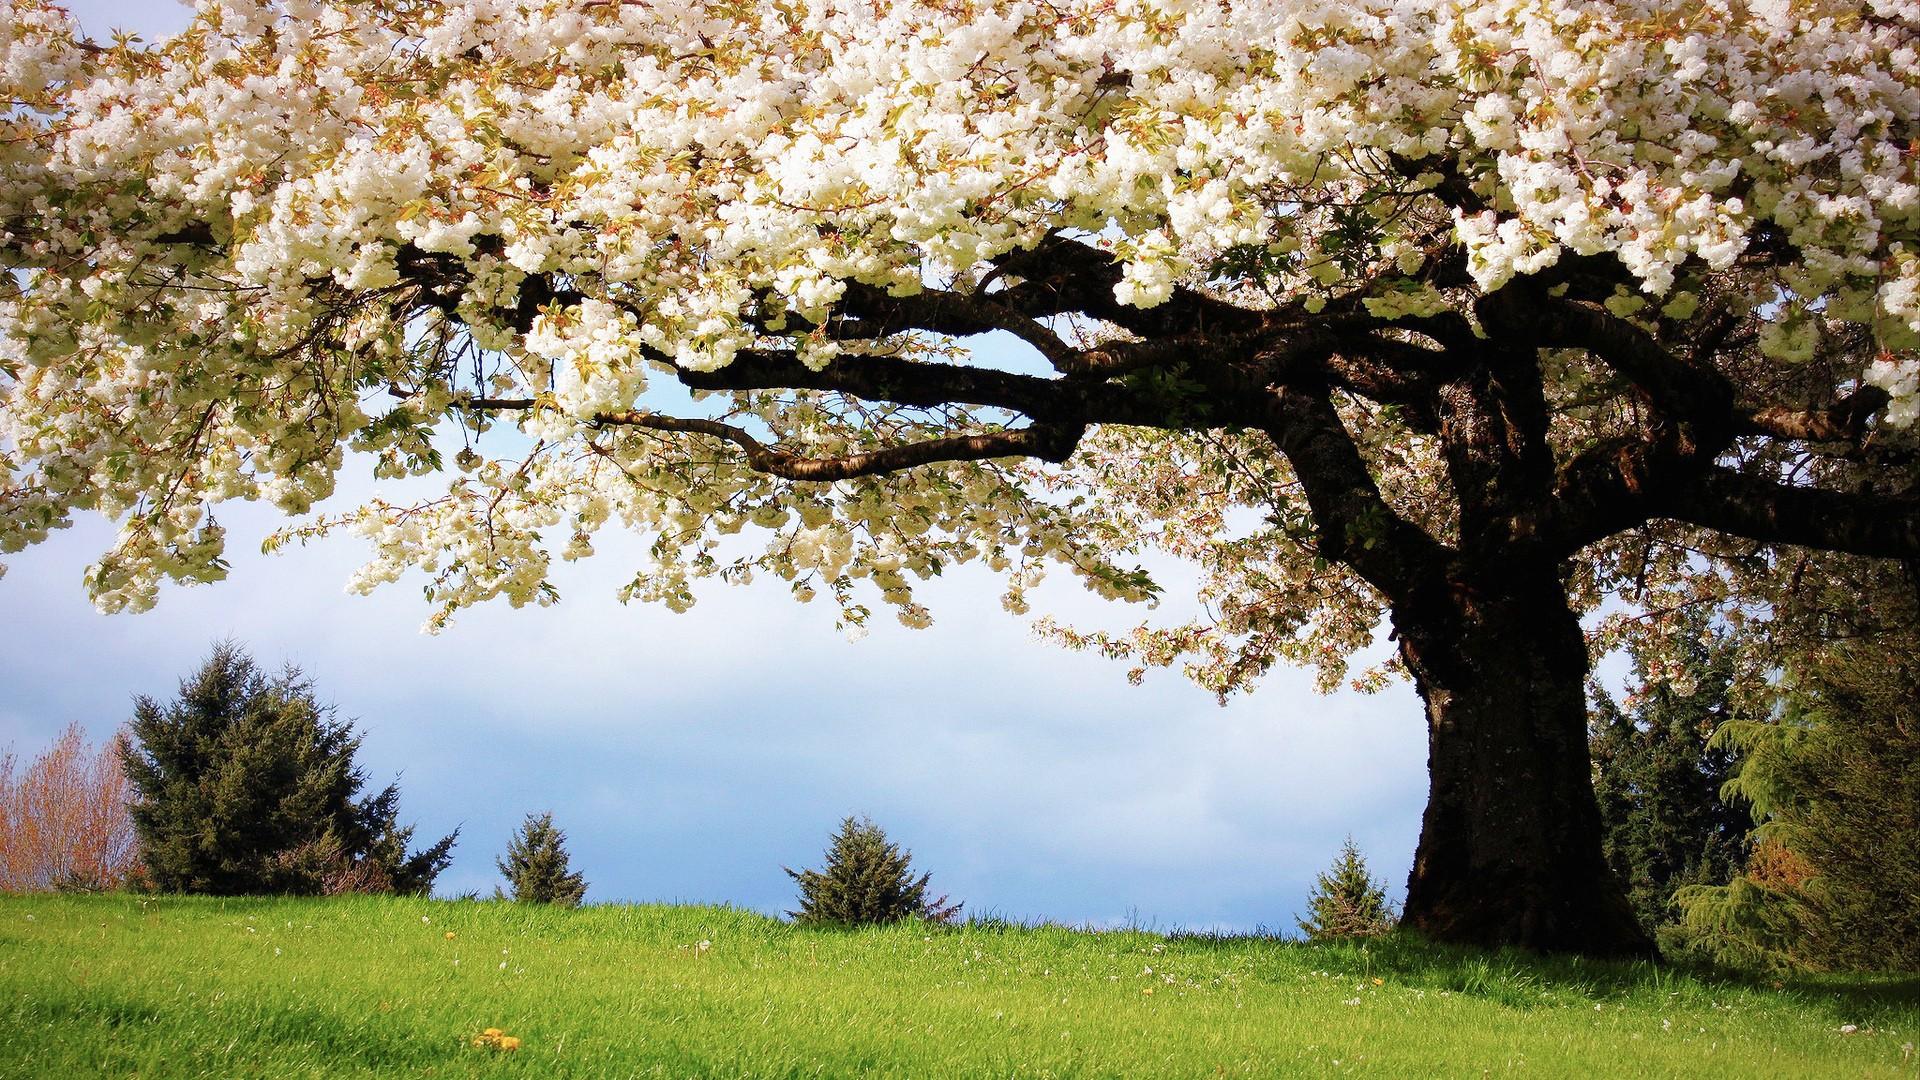 Весна фото обои на рабочий стол